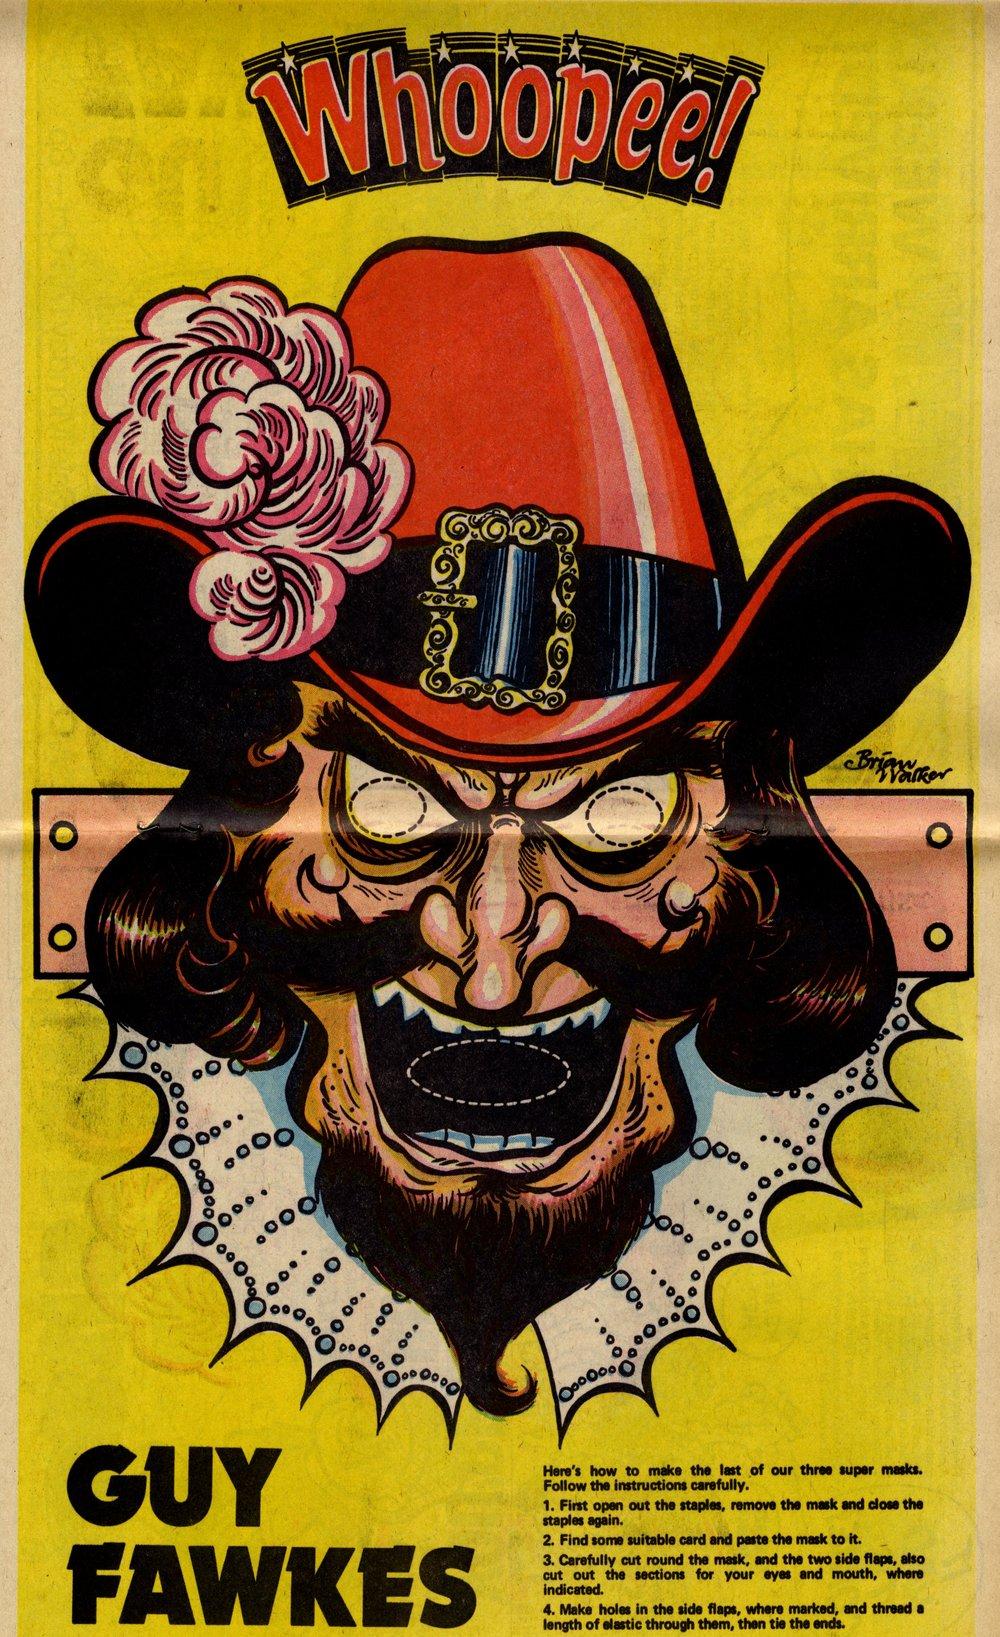 Guy Fawkes poster: Brian Walker (artist)